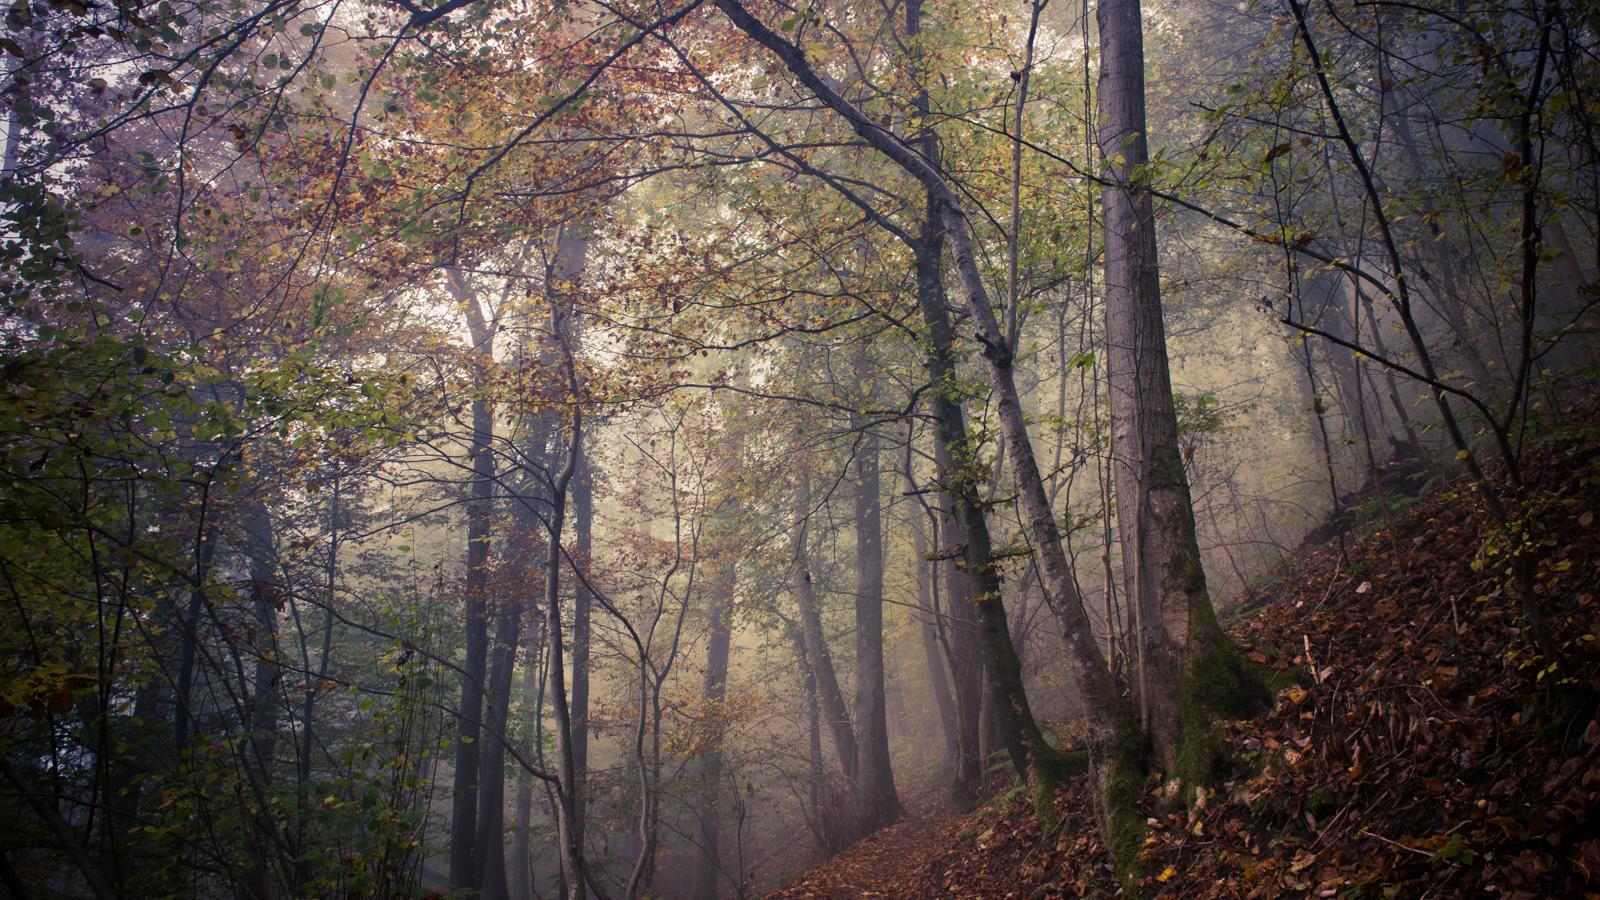 Zsofia_Daniel_Trees-5.jpg